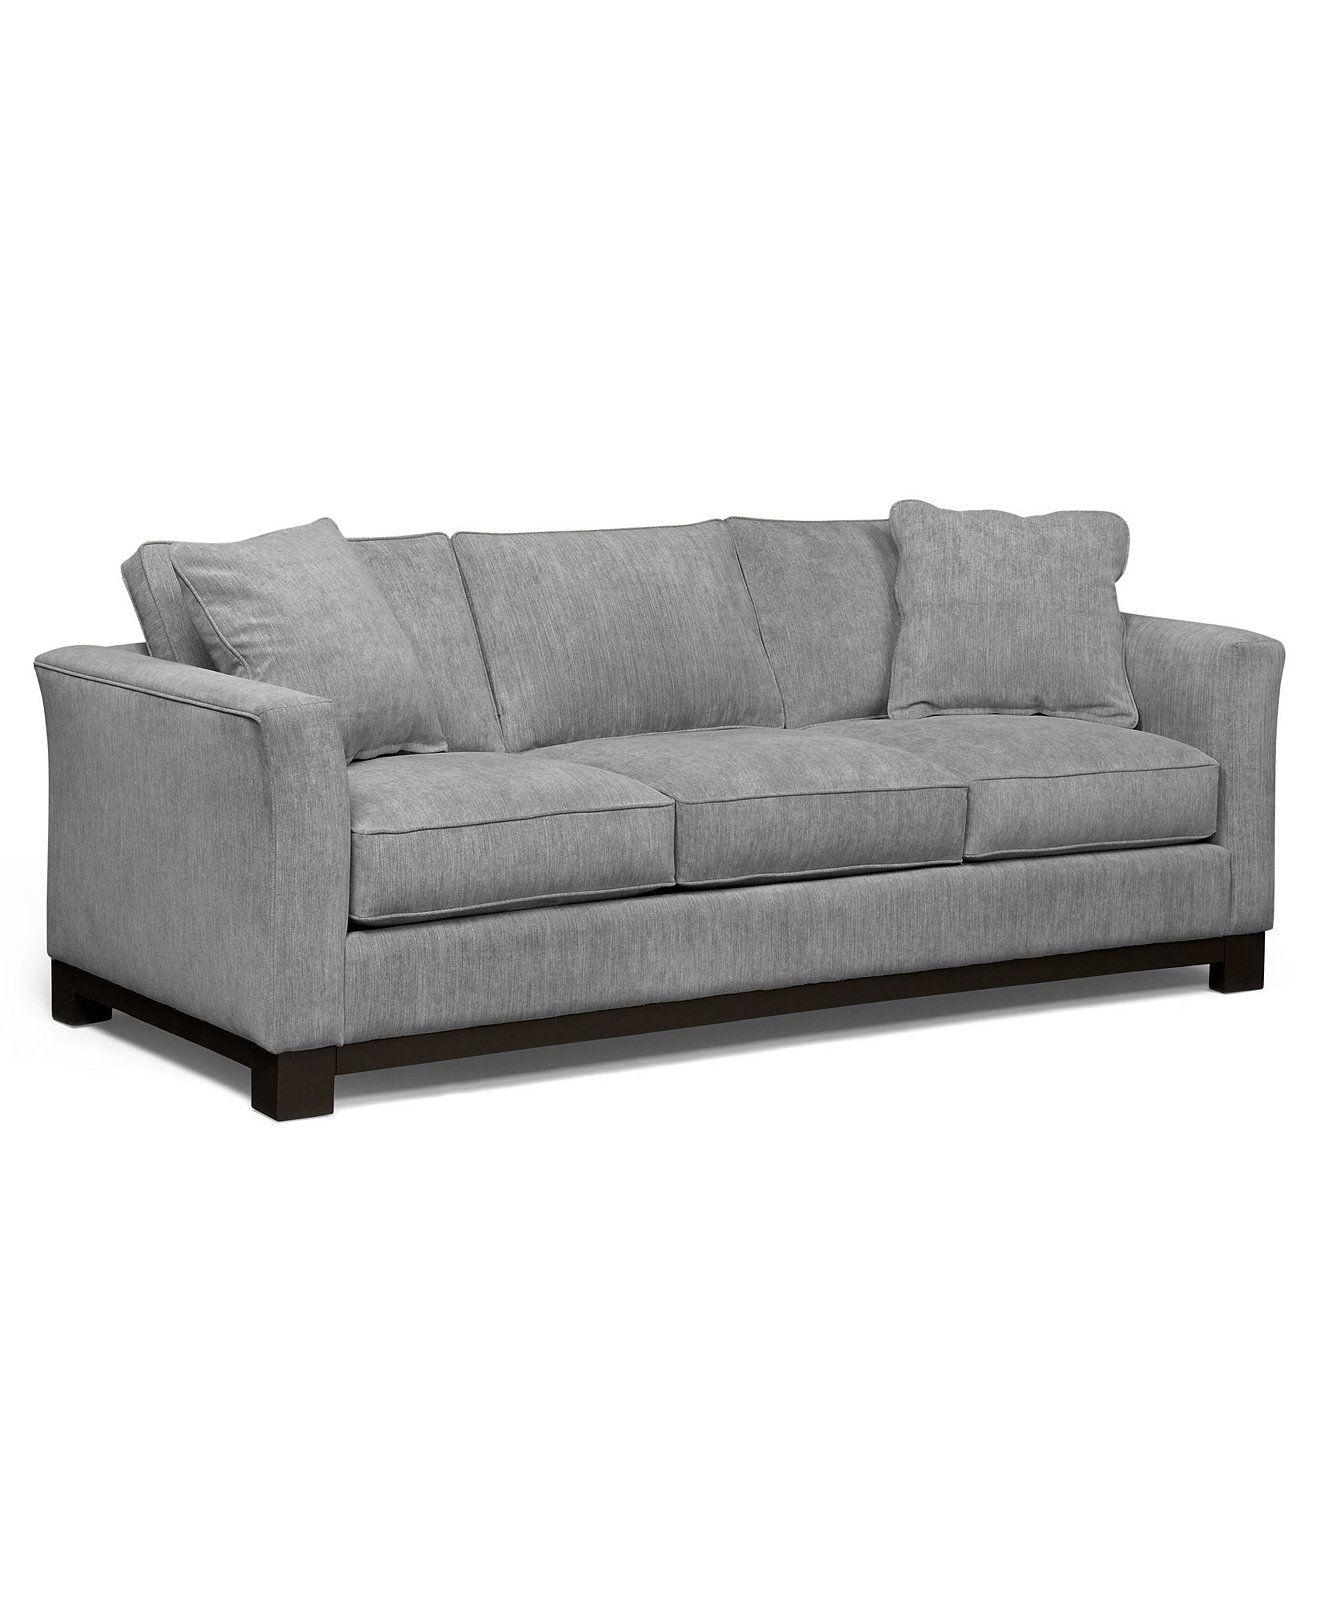 Kenton Fabric Sofa Custom Colors Couches Sofas Furniture Macy S